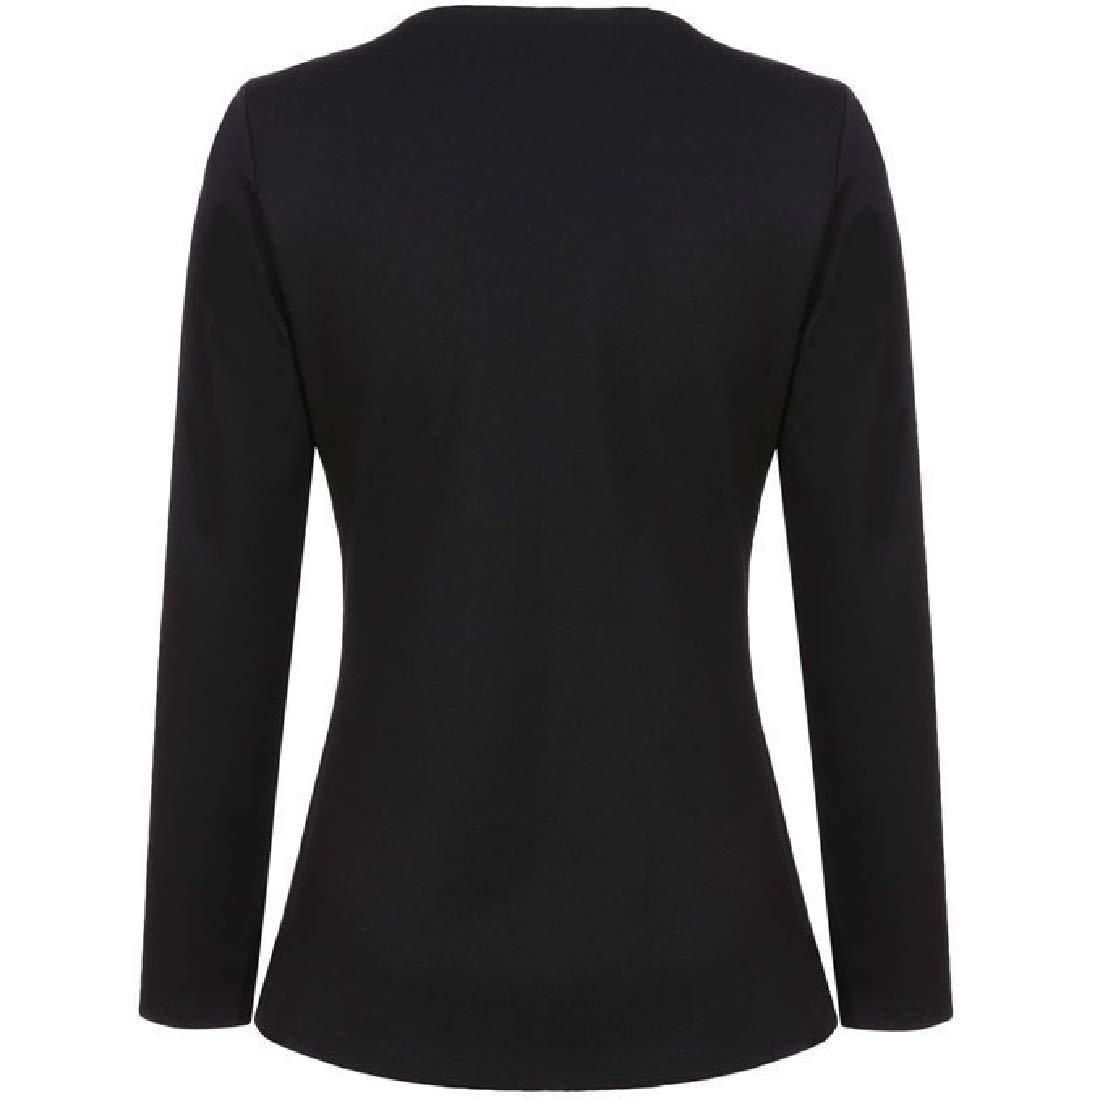 YUNY Womens Fashion Outwear Cardigan Small Blazer Coat Crewneck Jacket Black XS